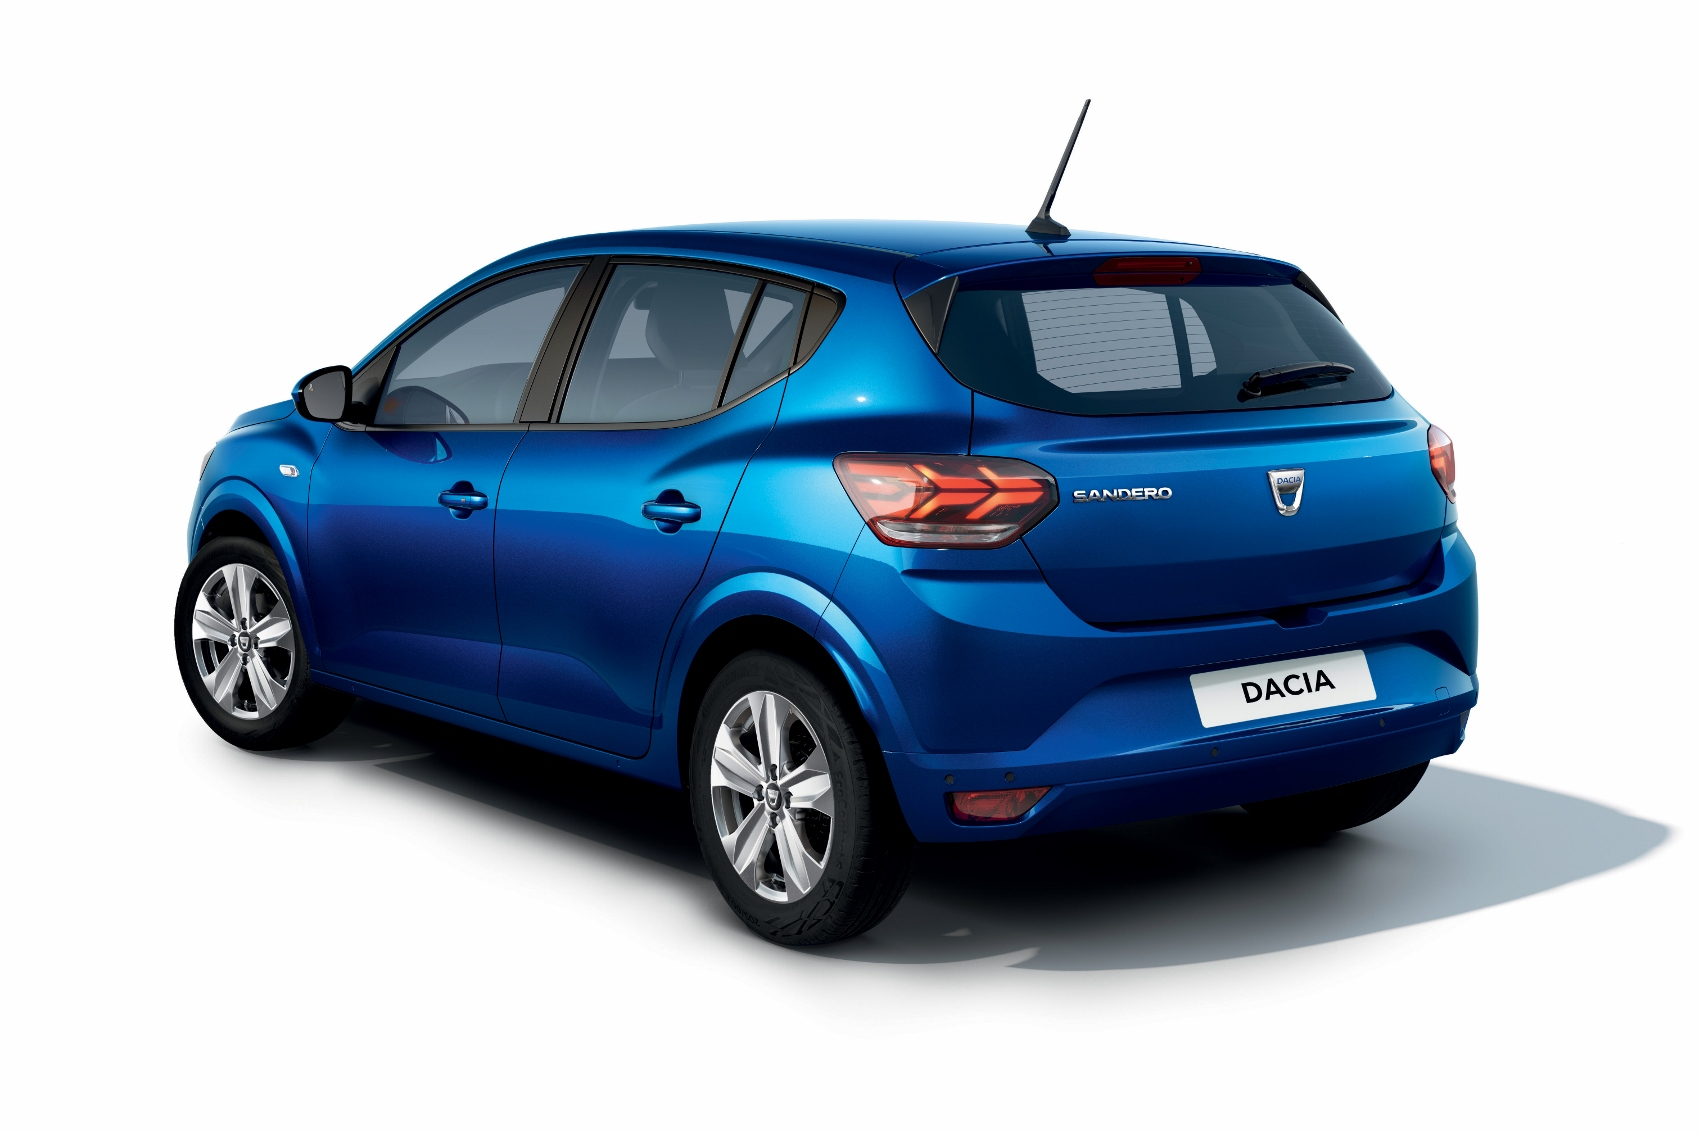 2020 - New Dacia SANDERO (2) (1700x1133)